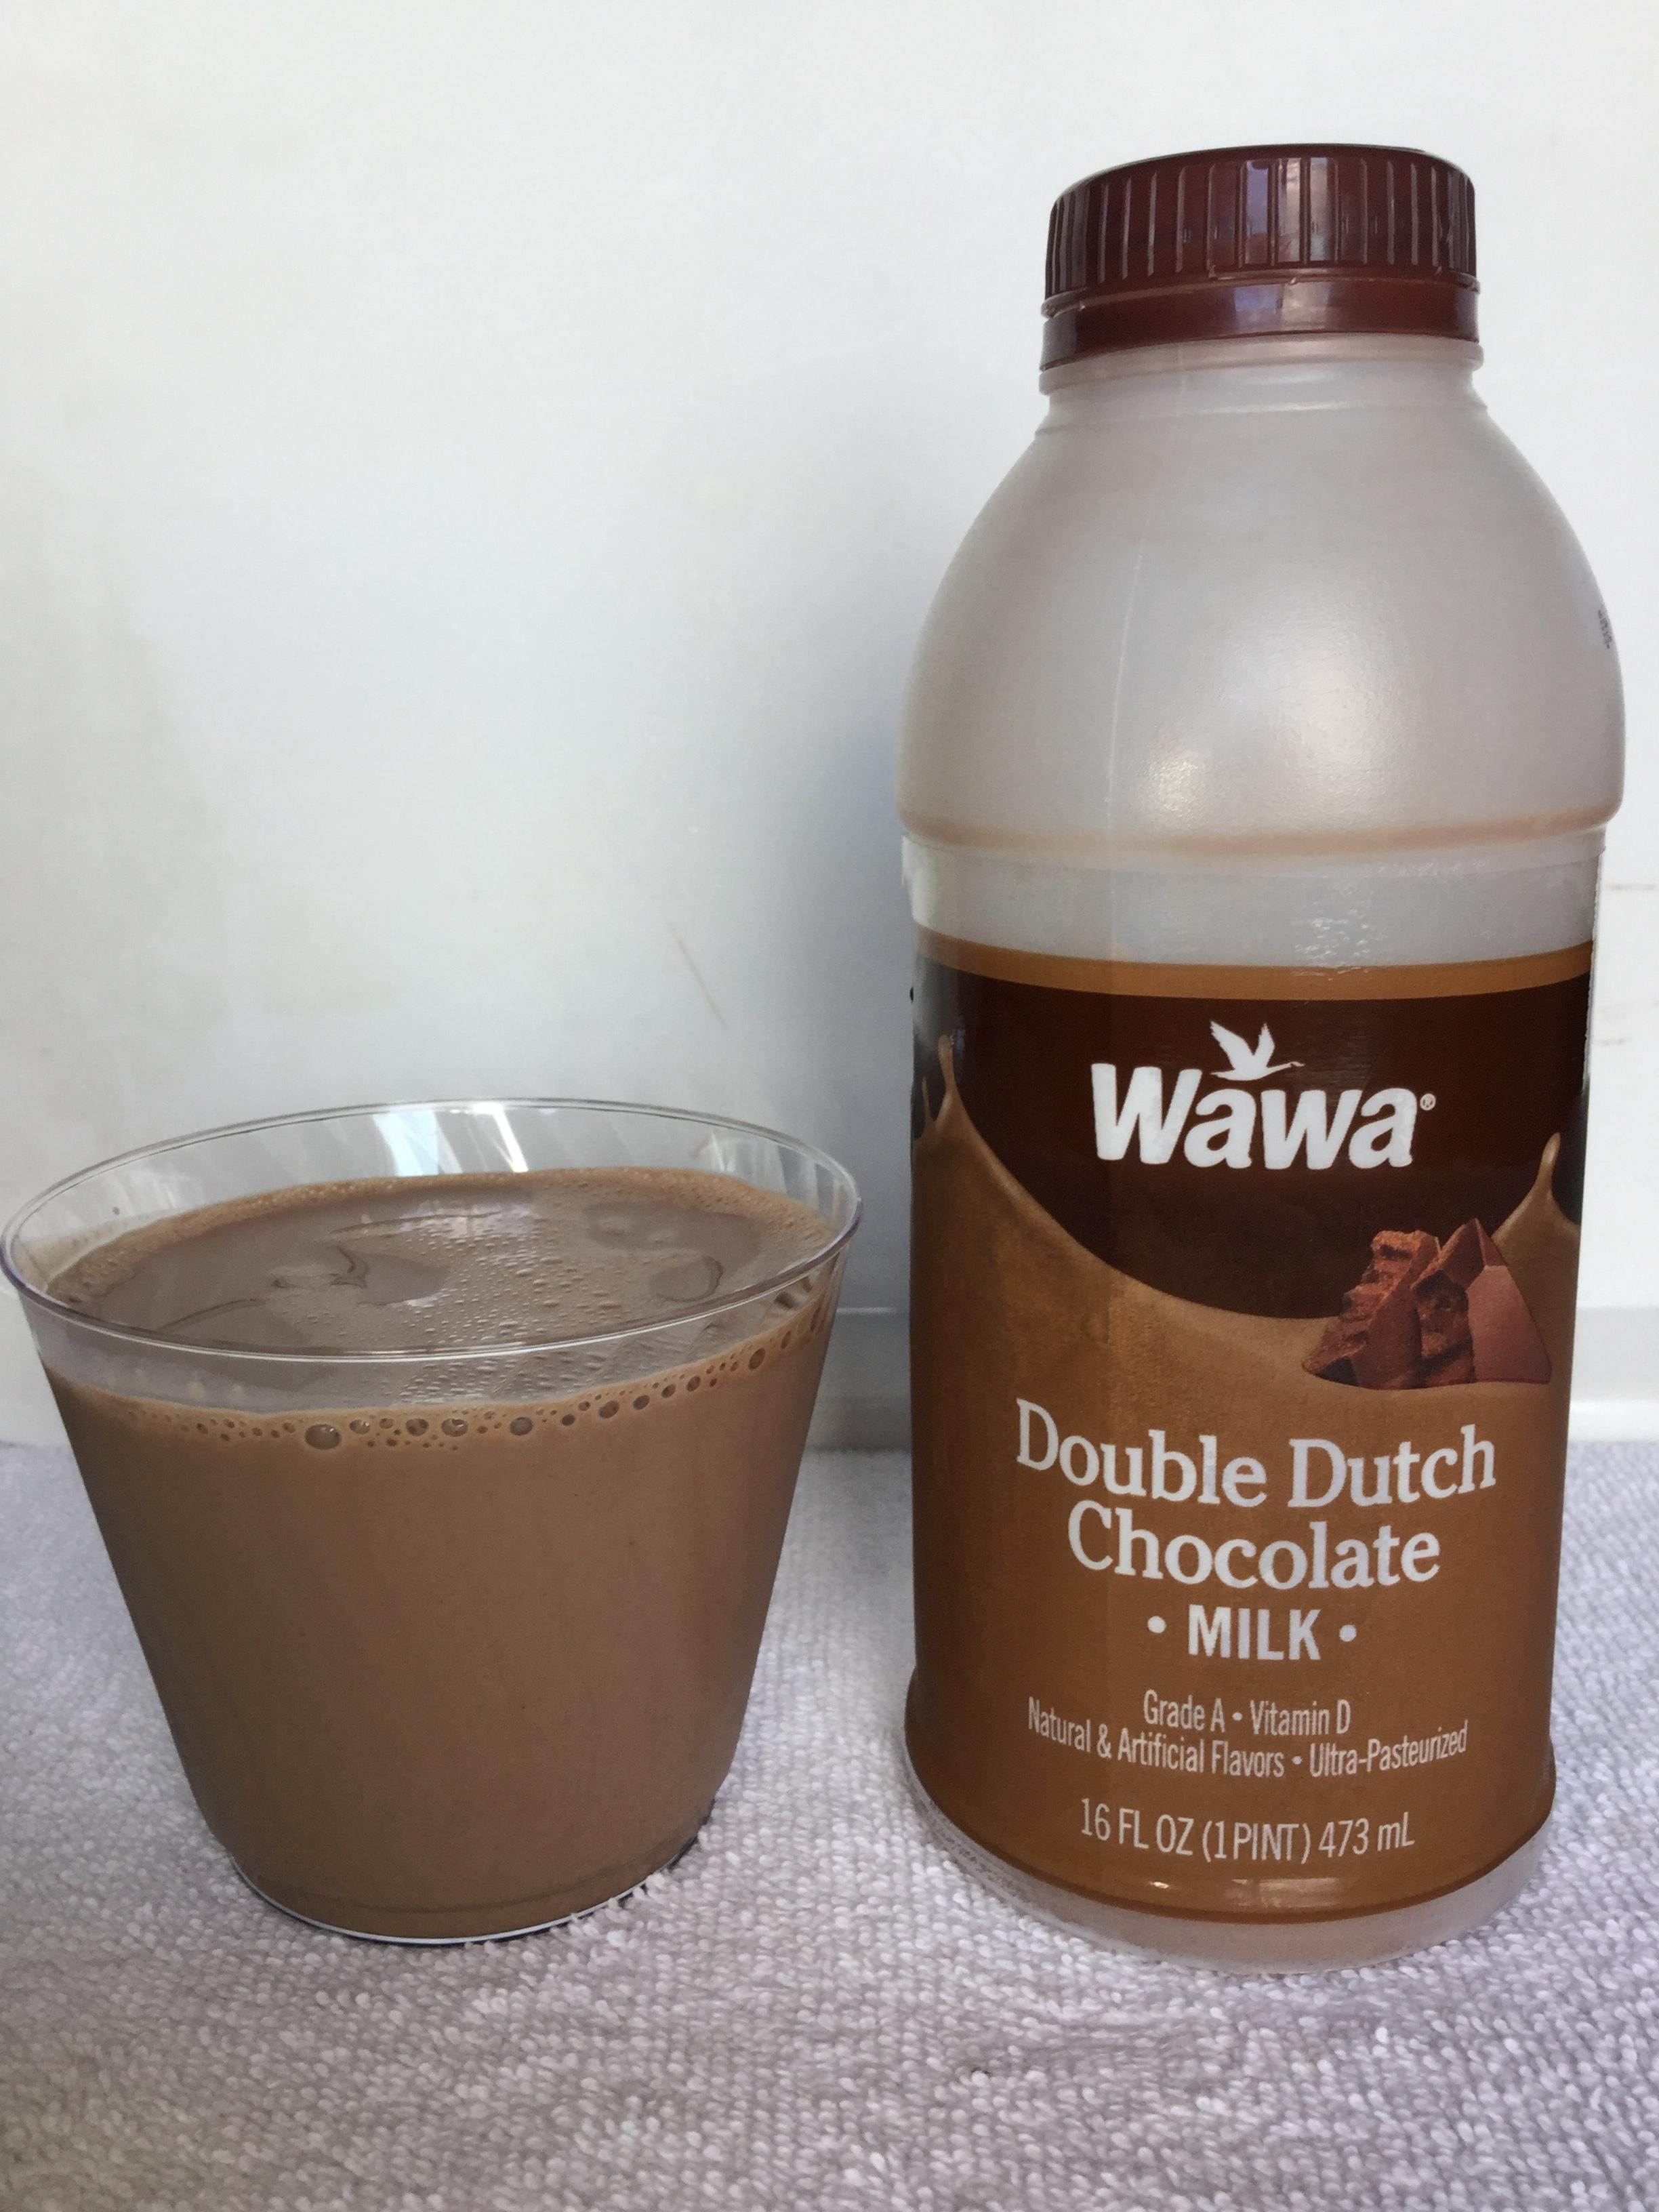 Wawa Double Dutch Chocolate Milk Cup